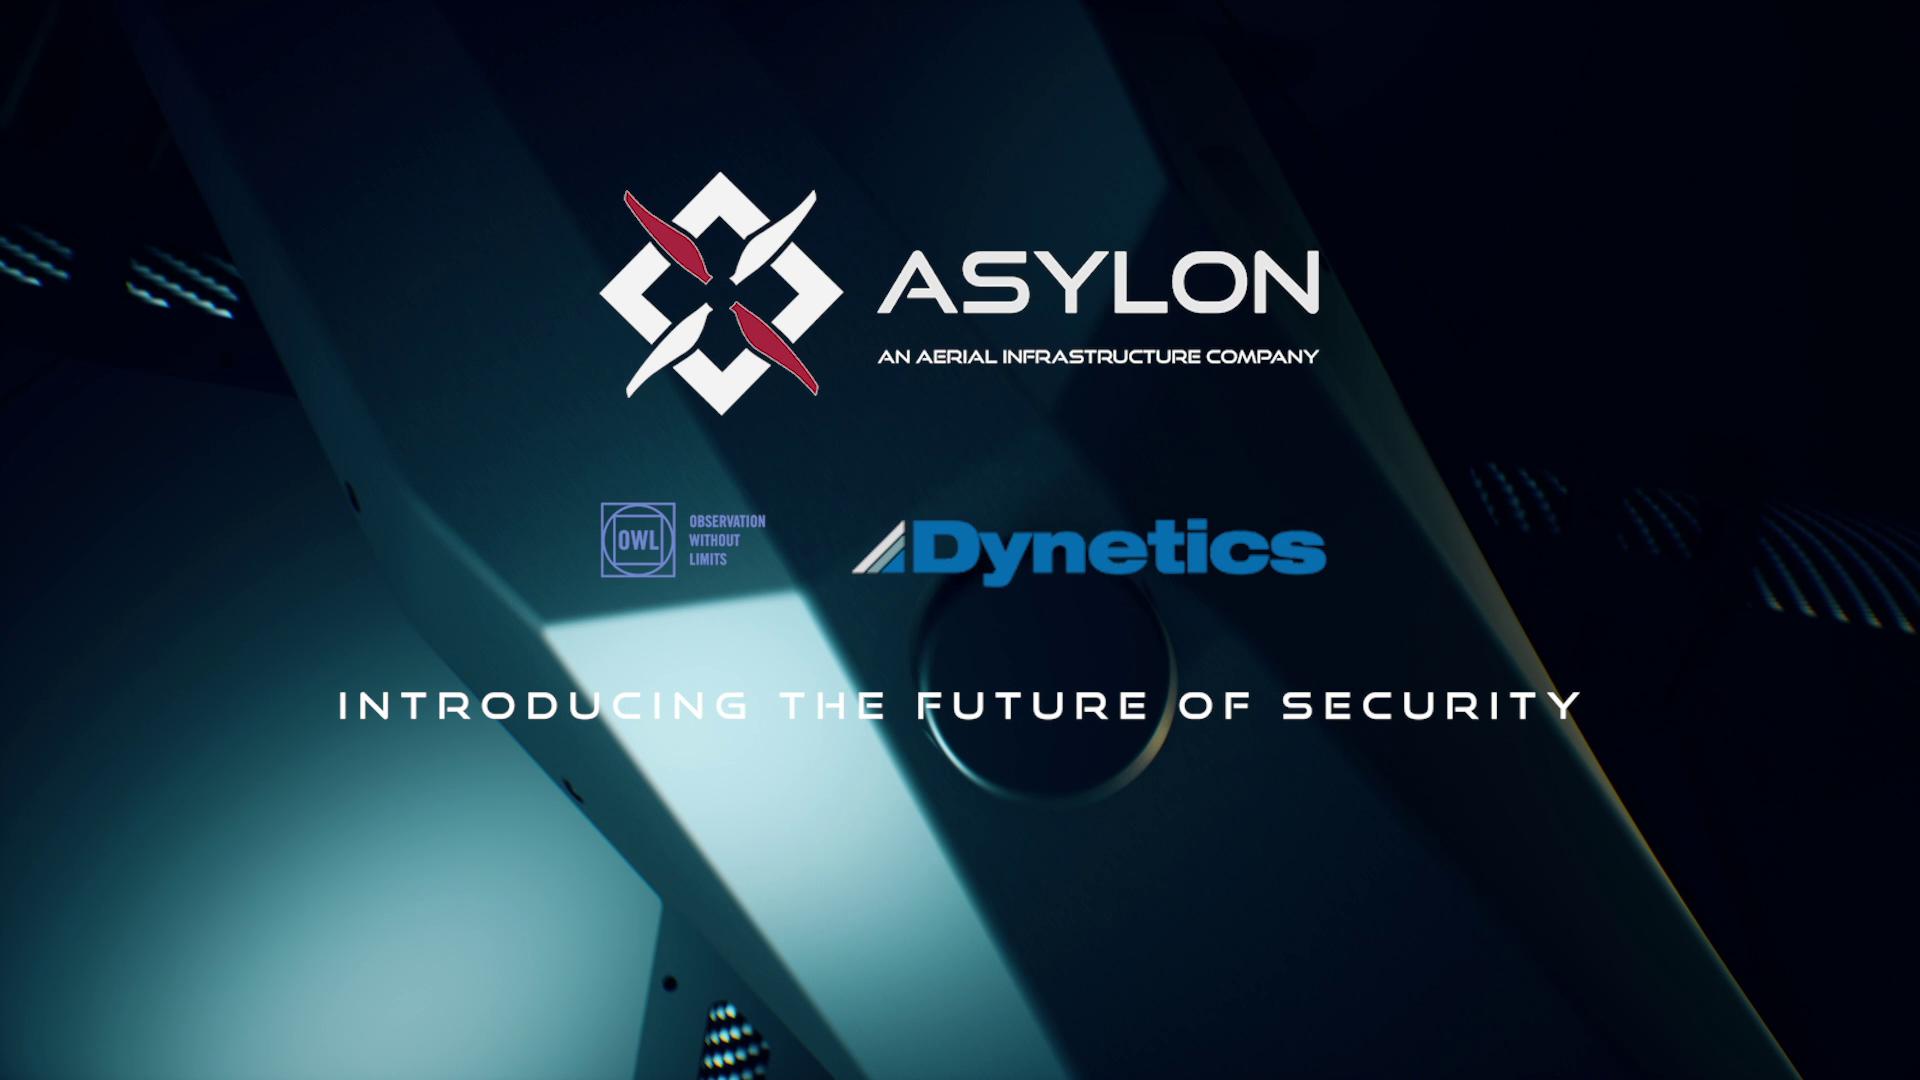 Asylon and O.W.L. Execute Partnership to Provide Future of Autonomous Security Operations